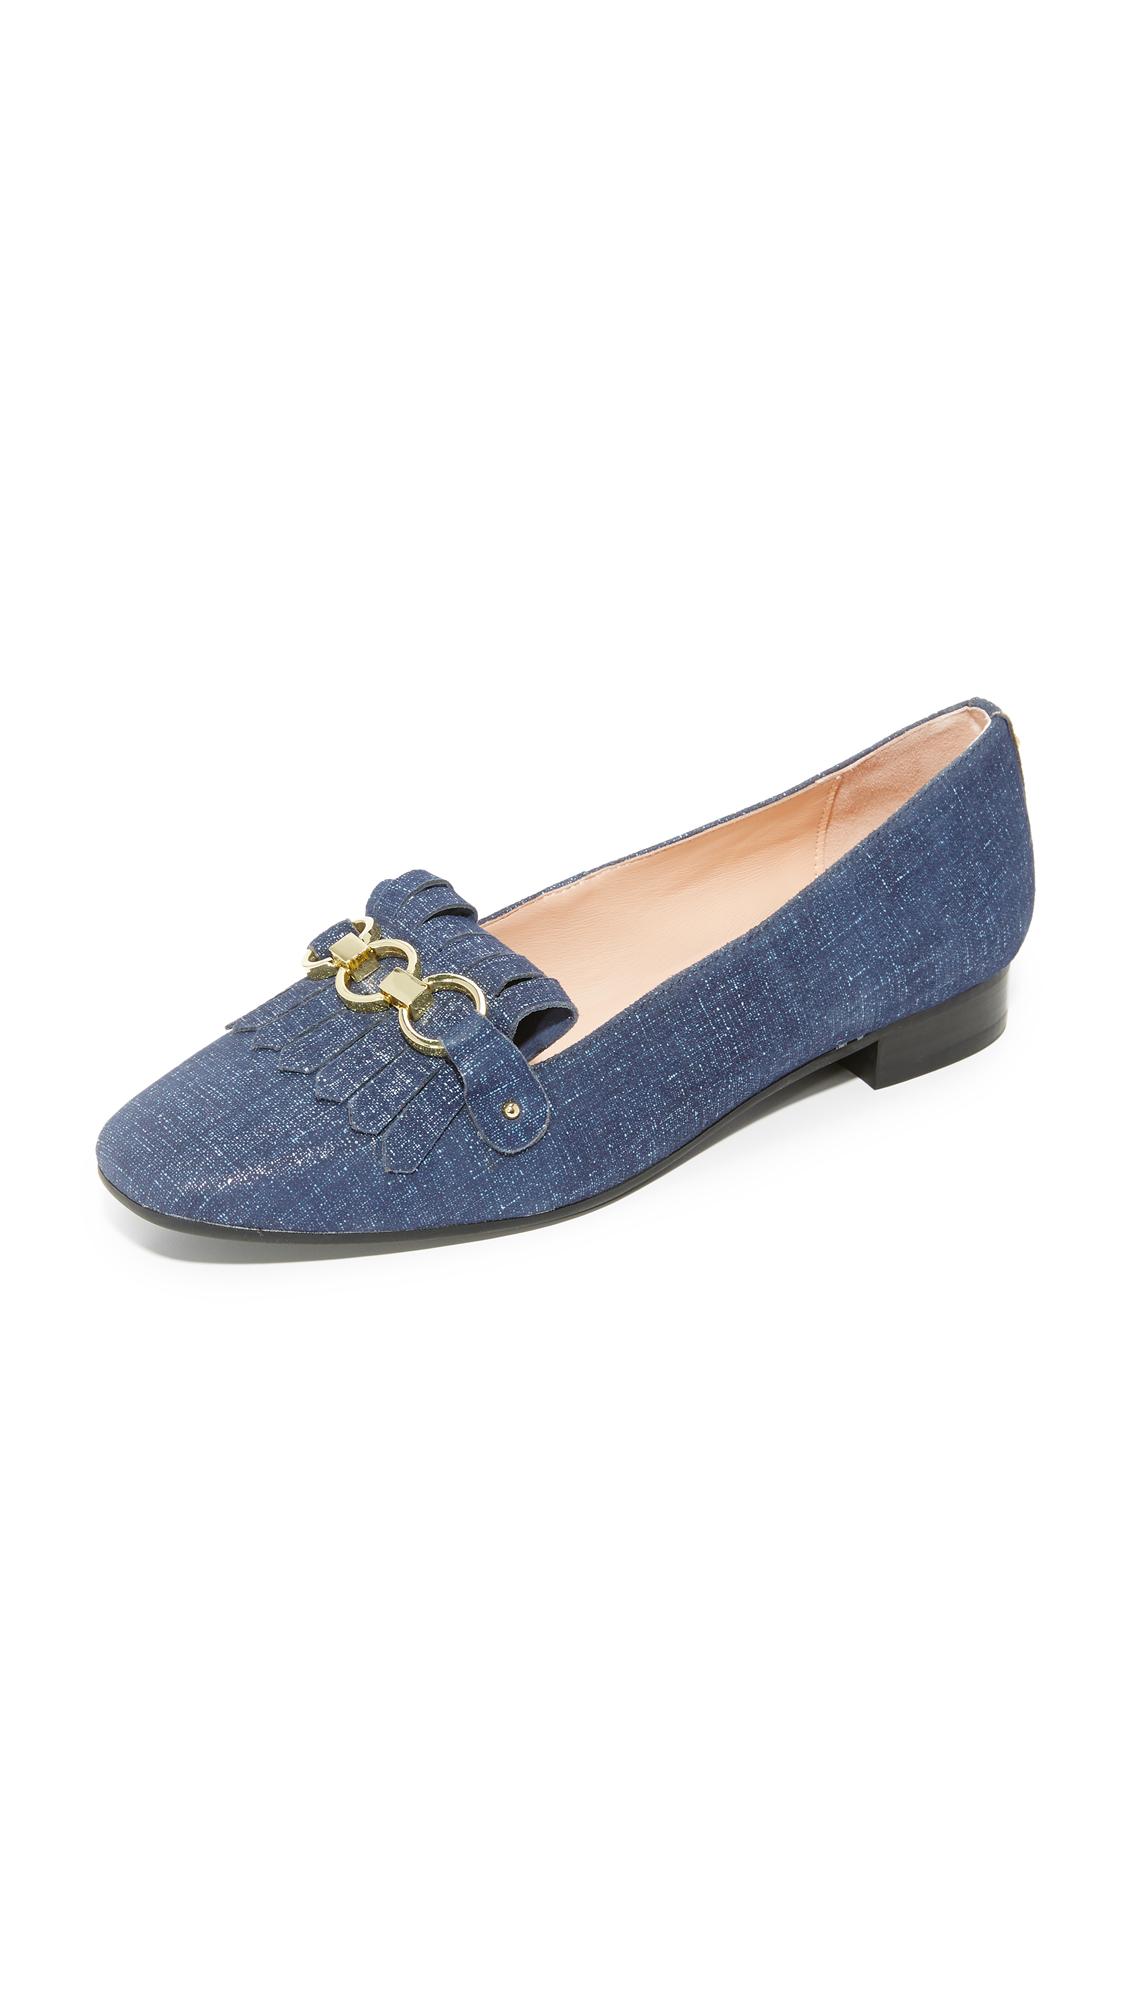 Photo of Kate Spade New York Karen Loafers Blue Denim - Kate Spade New York online